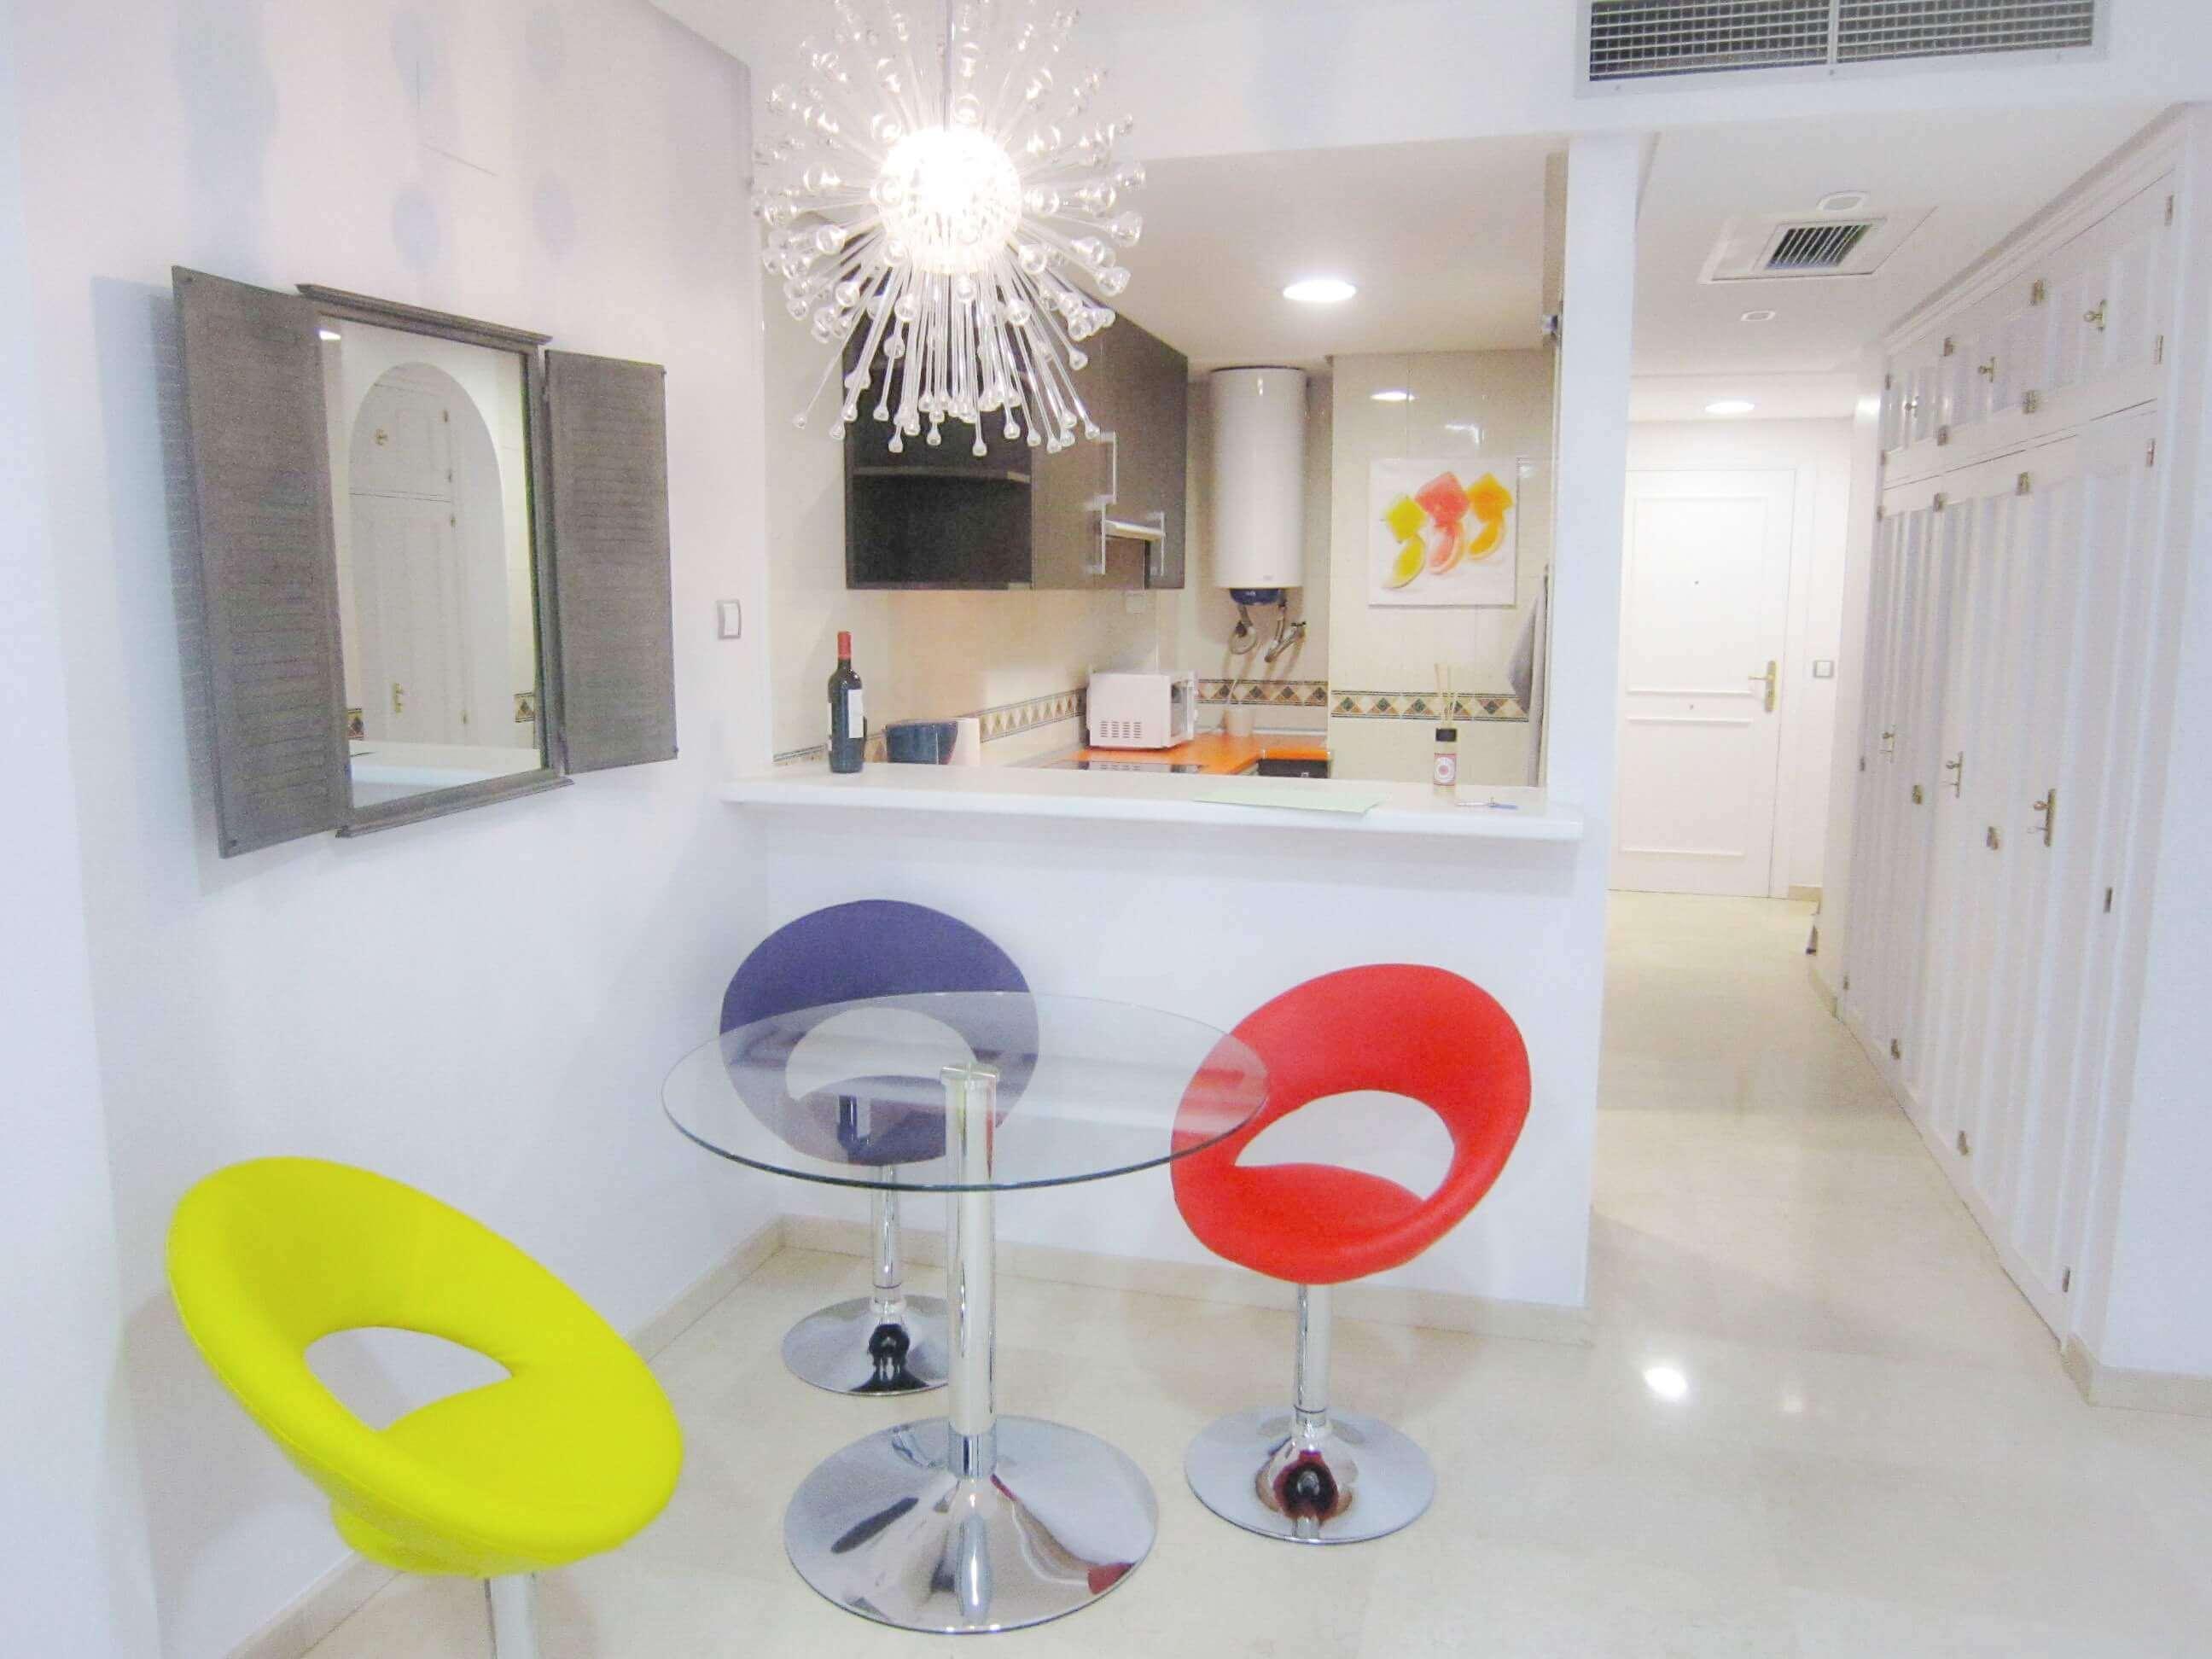 alquiler pisos en Retiro - Madrid Alquiler Por Días